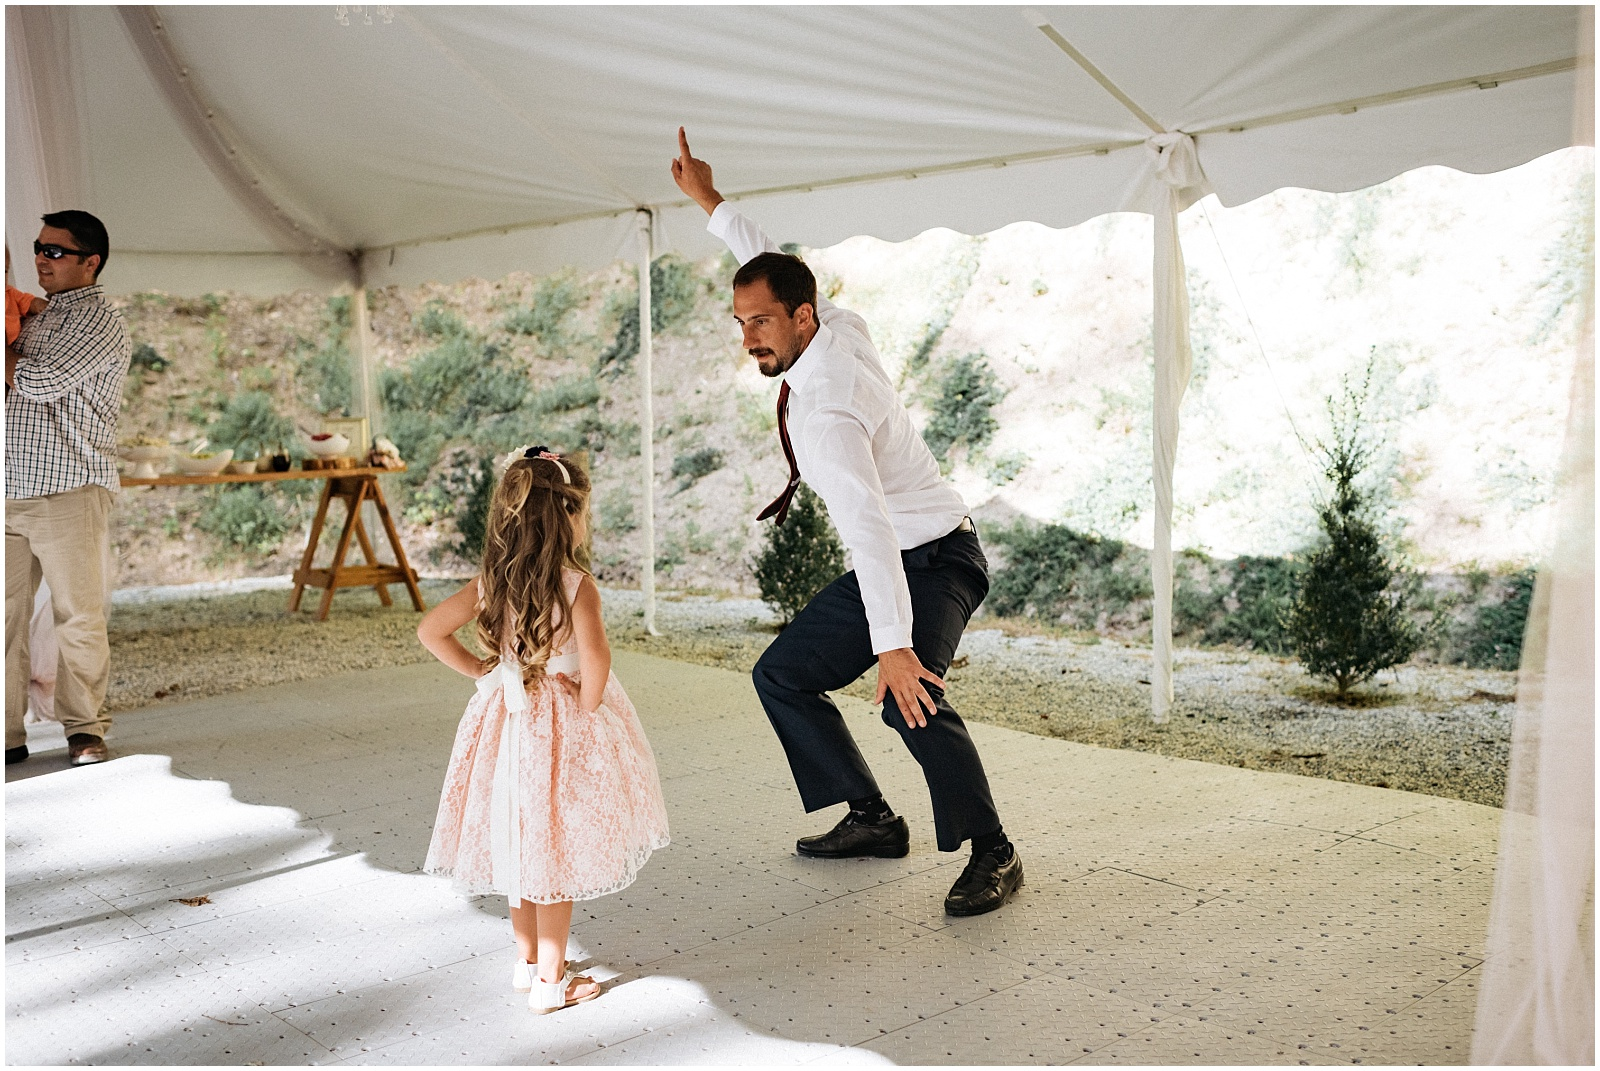 Top dancing picture from Nantahala wedding